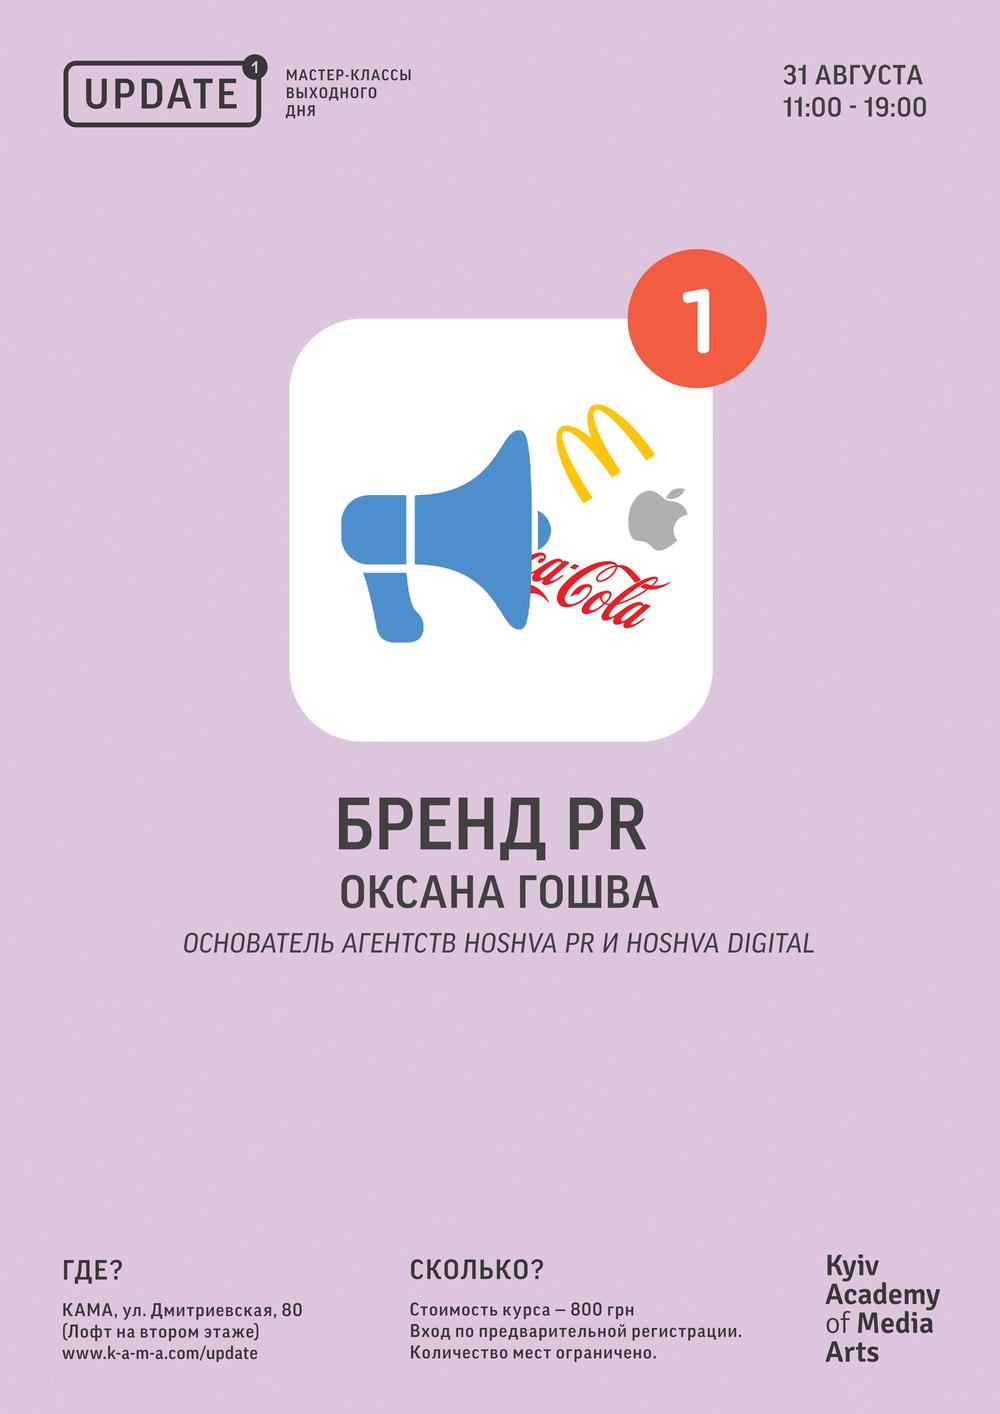 Бренд pr kyiv academy of media arts  имеет Международную Квалификацию по public relations chartered institute of public relations london uk и диплом executive mba digital